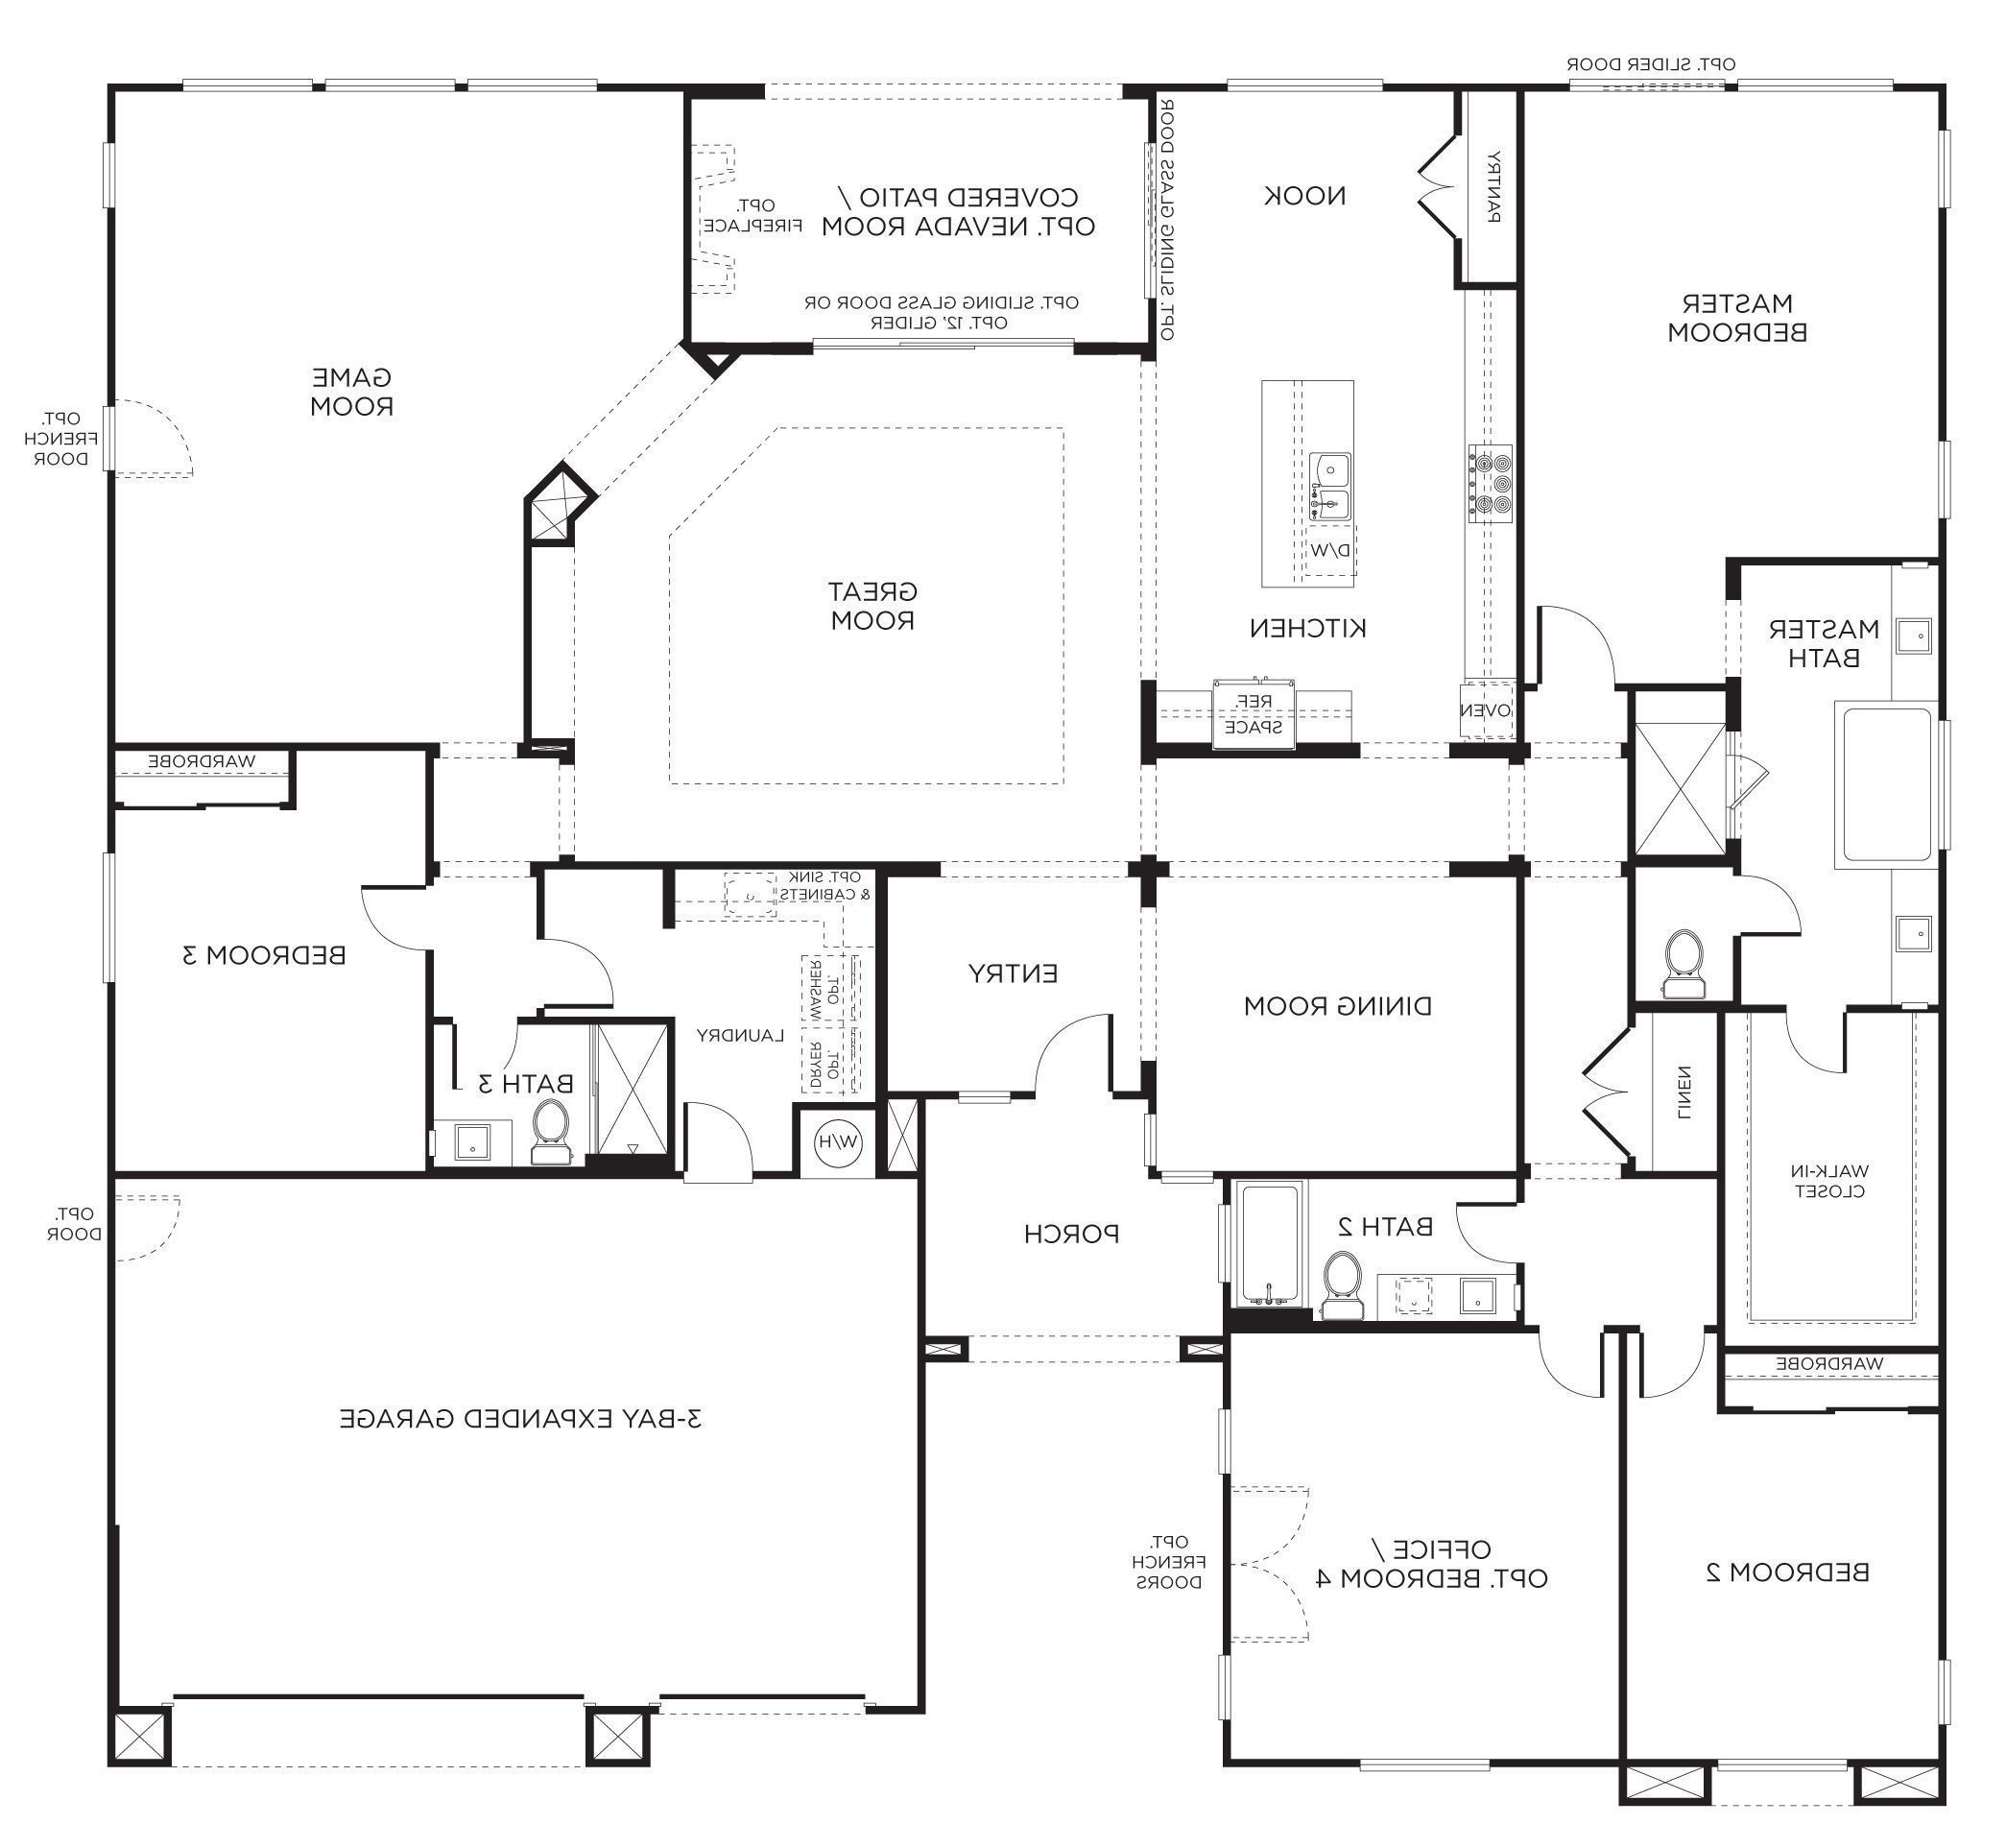 Single Story 4 Bedroom House Plans Home Design Ideas